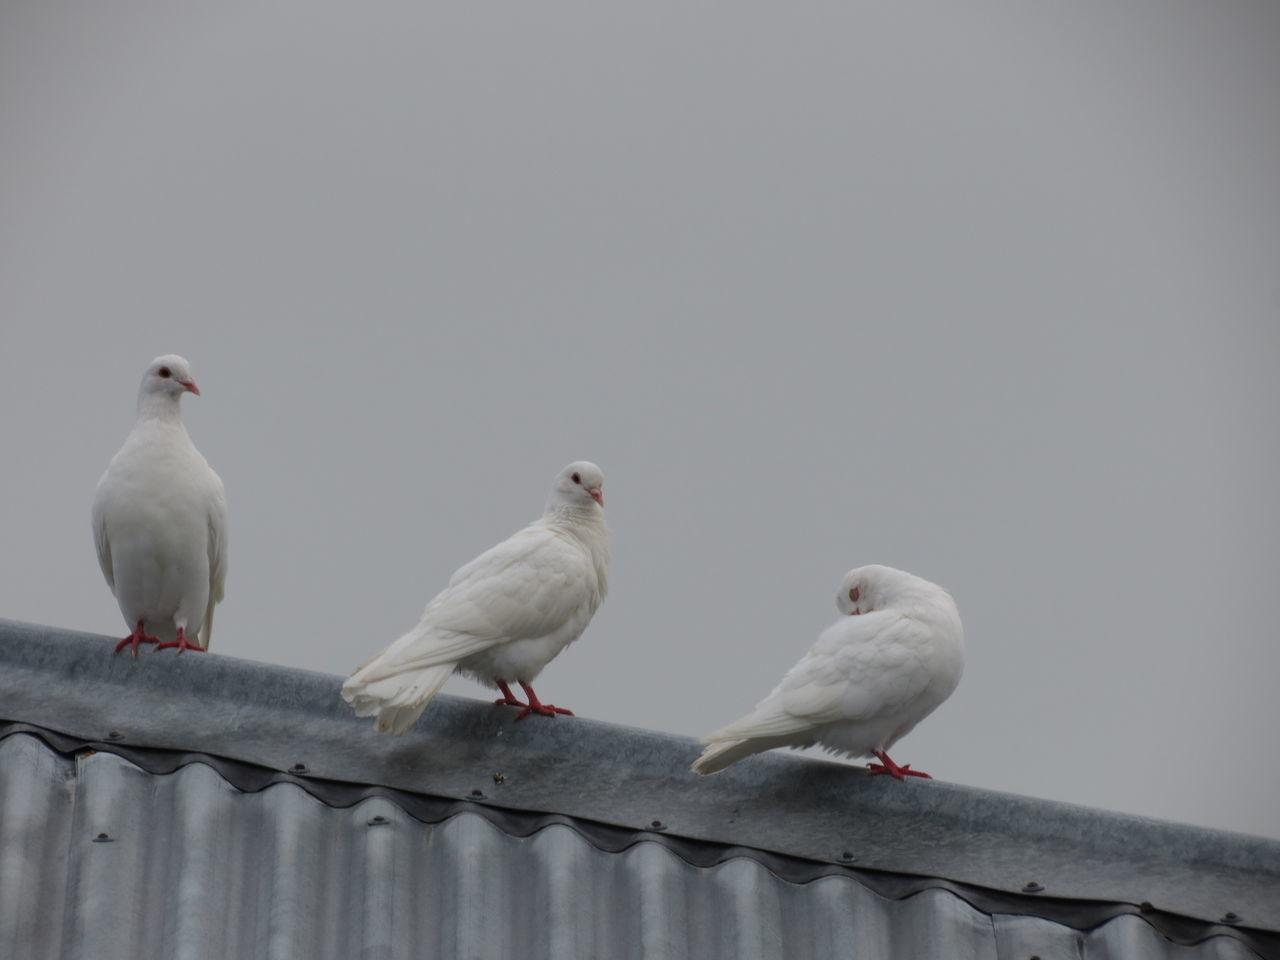 Beautiful stock photos of friedenstaube, bird, animal themes, animals in the wild, perching